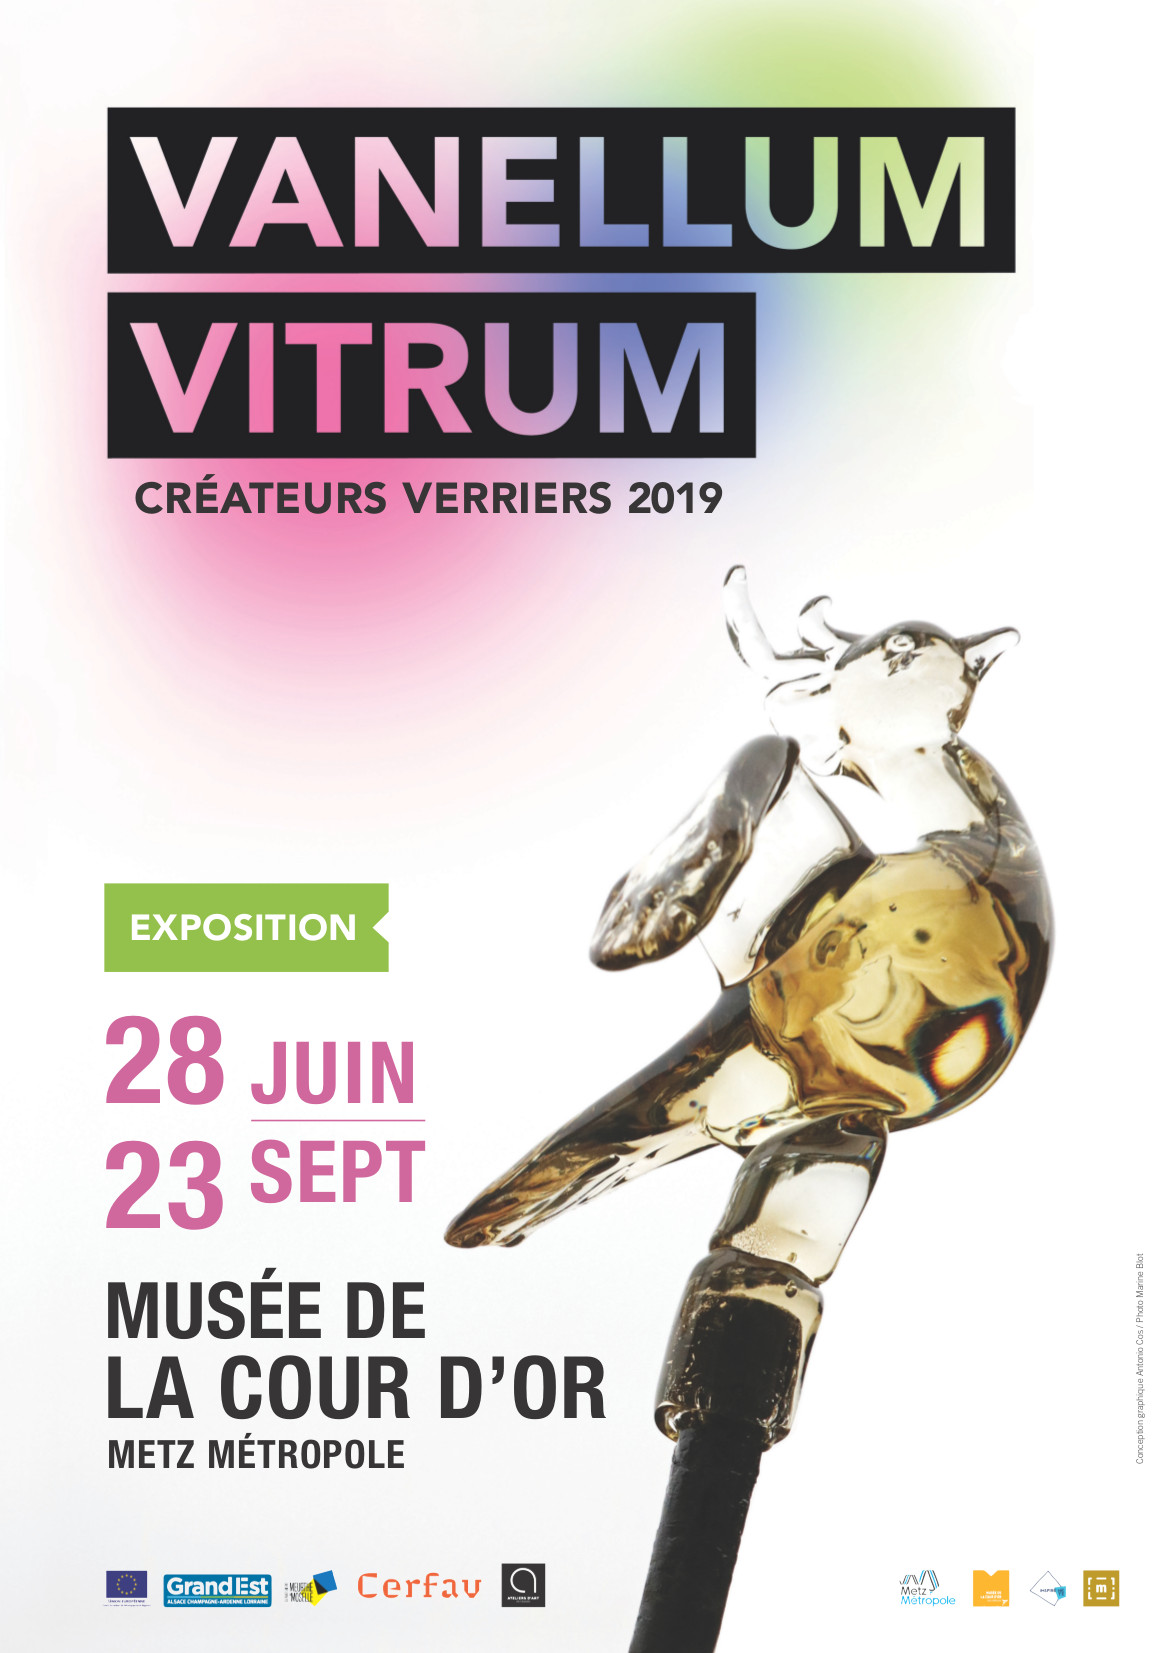 exposition verre vanellum vitrum createur verrier cerfav cour metz